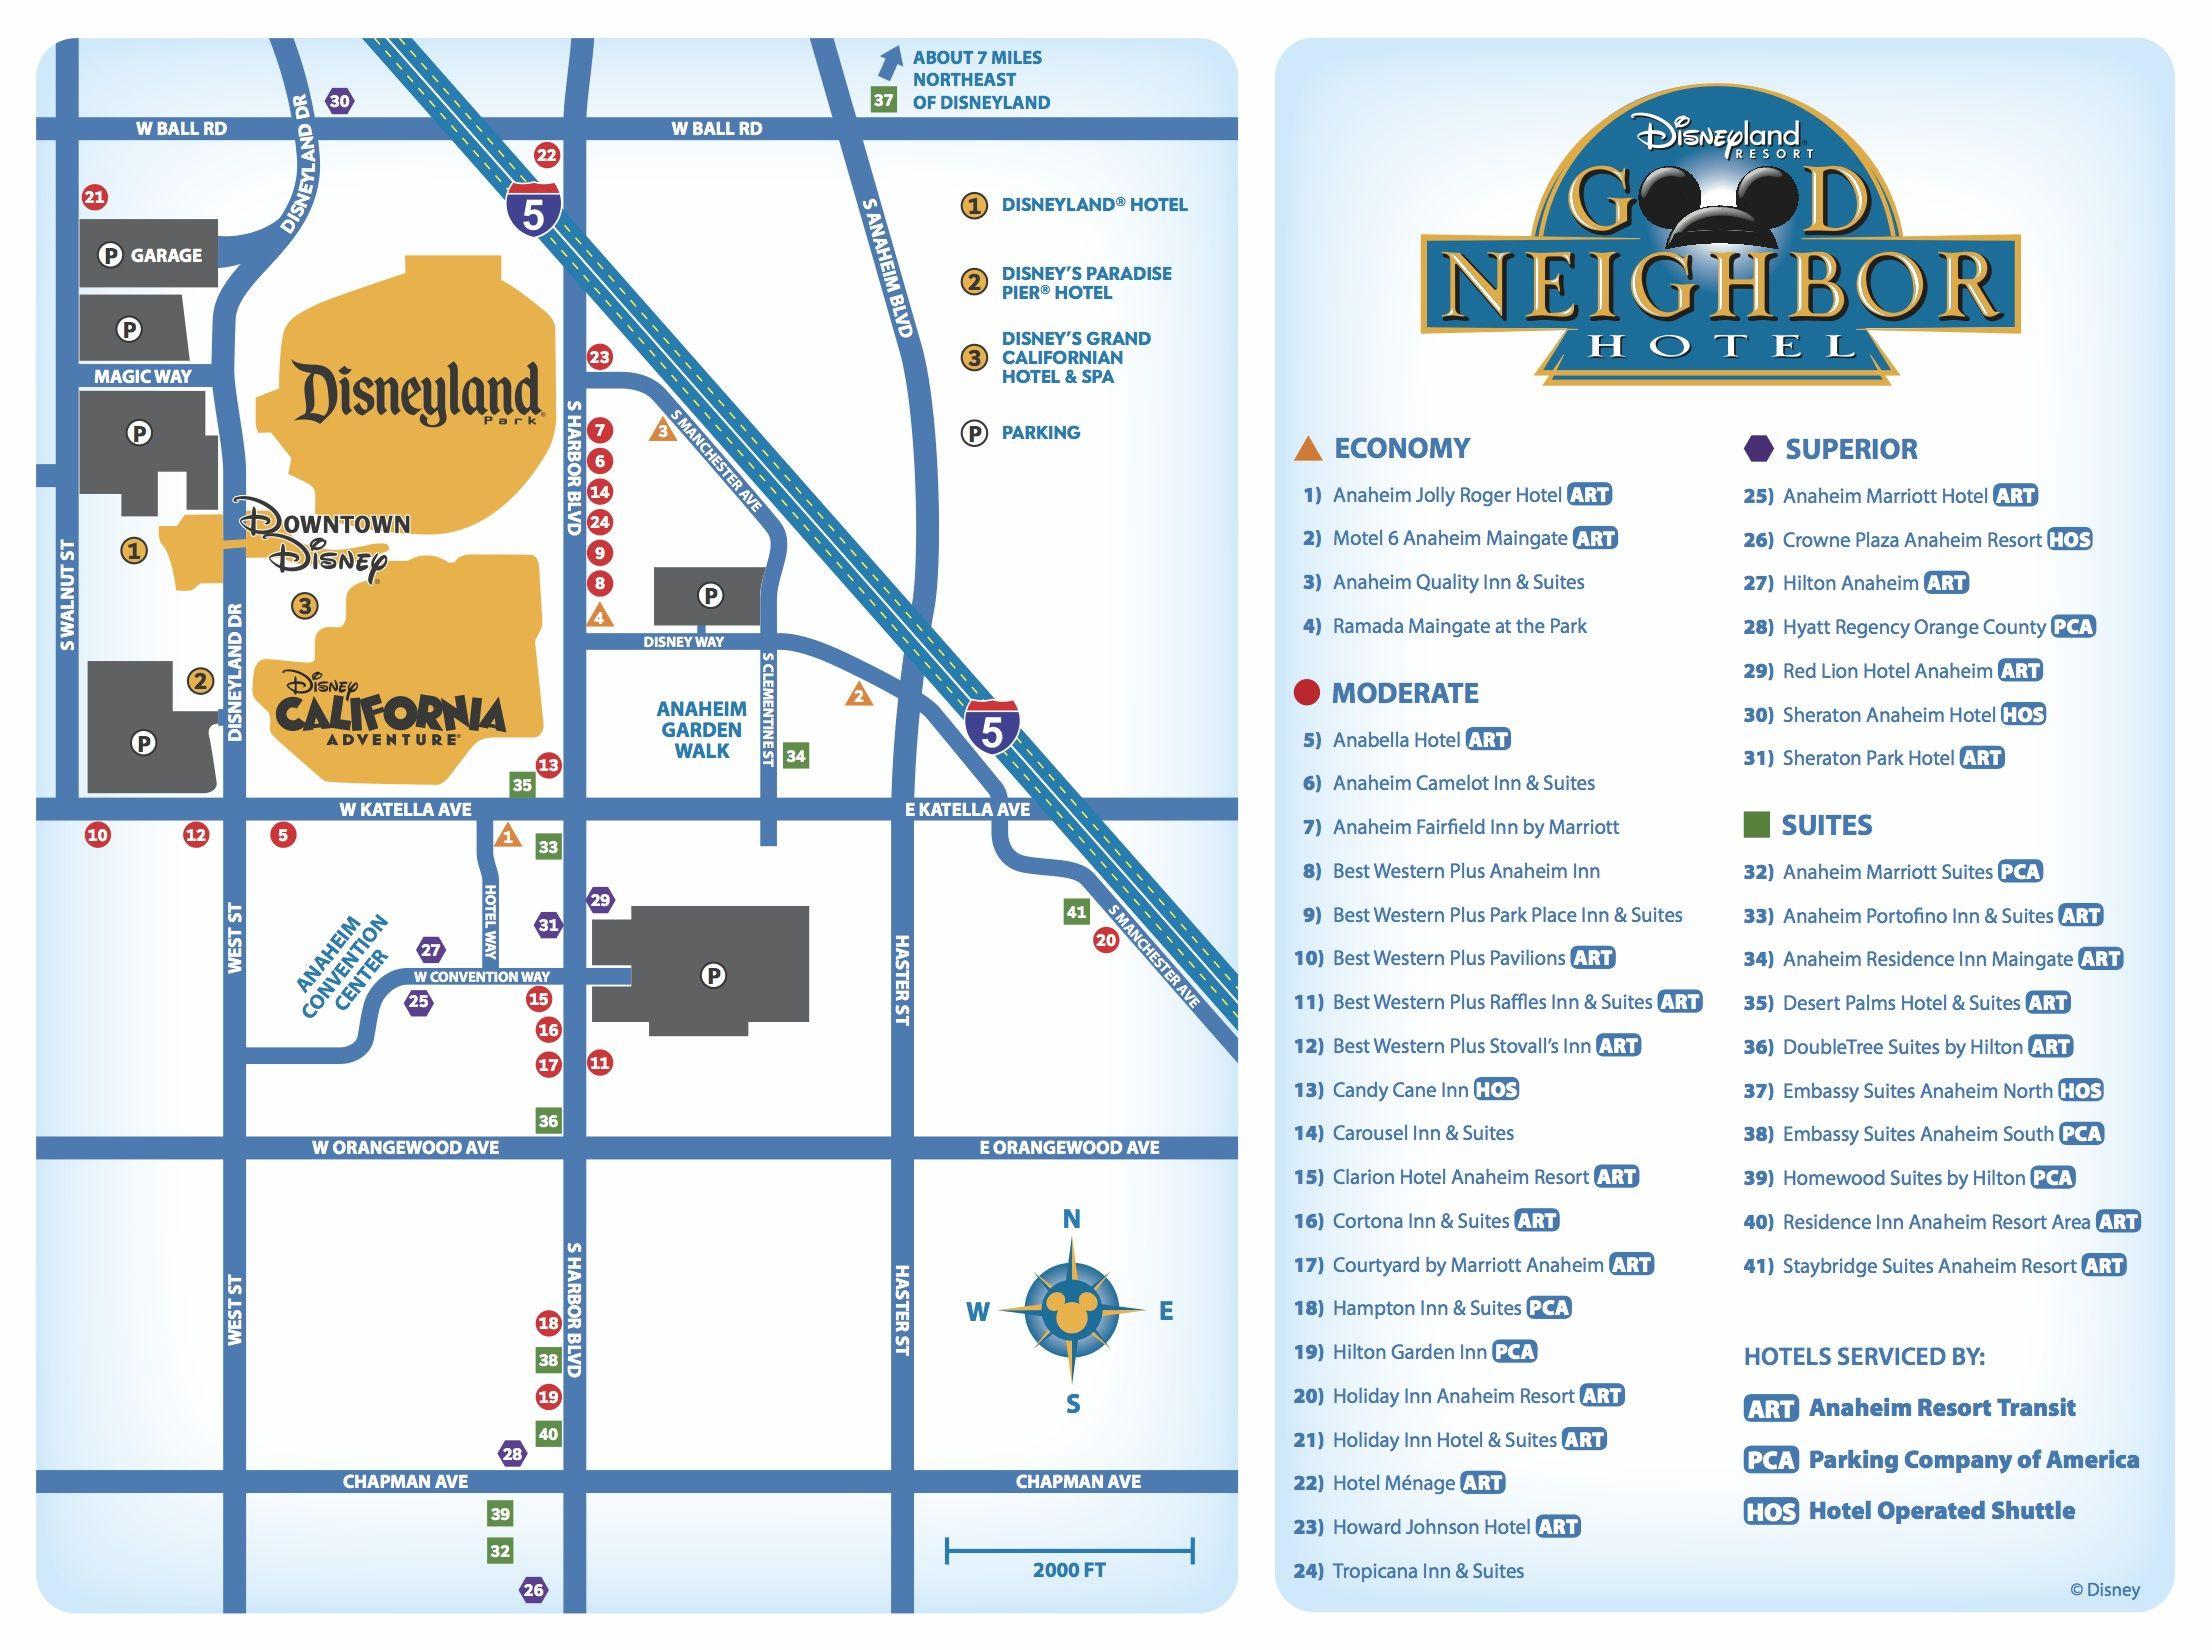 Where To Stay For The Dumbo Double Dare ~ Disneyland Good Neighbor - Map Of Hotels Around Disneyland California